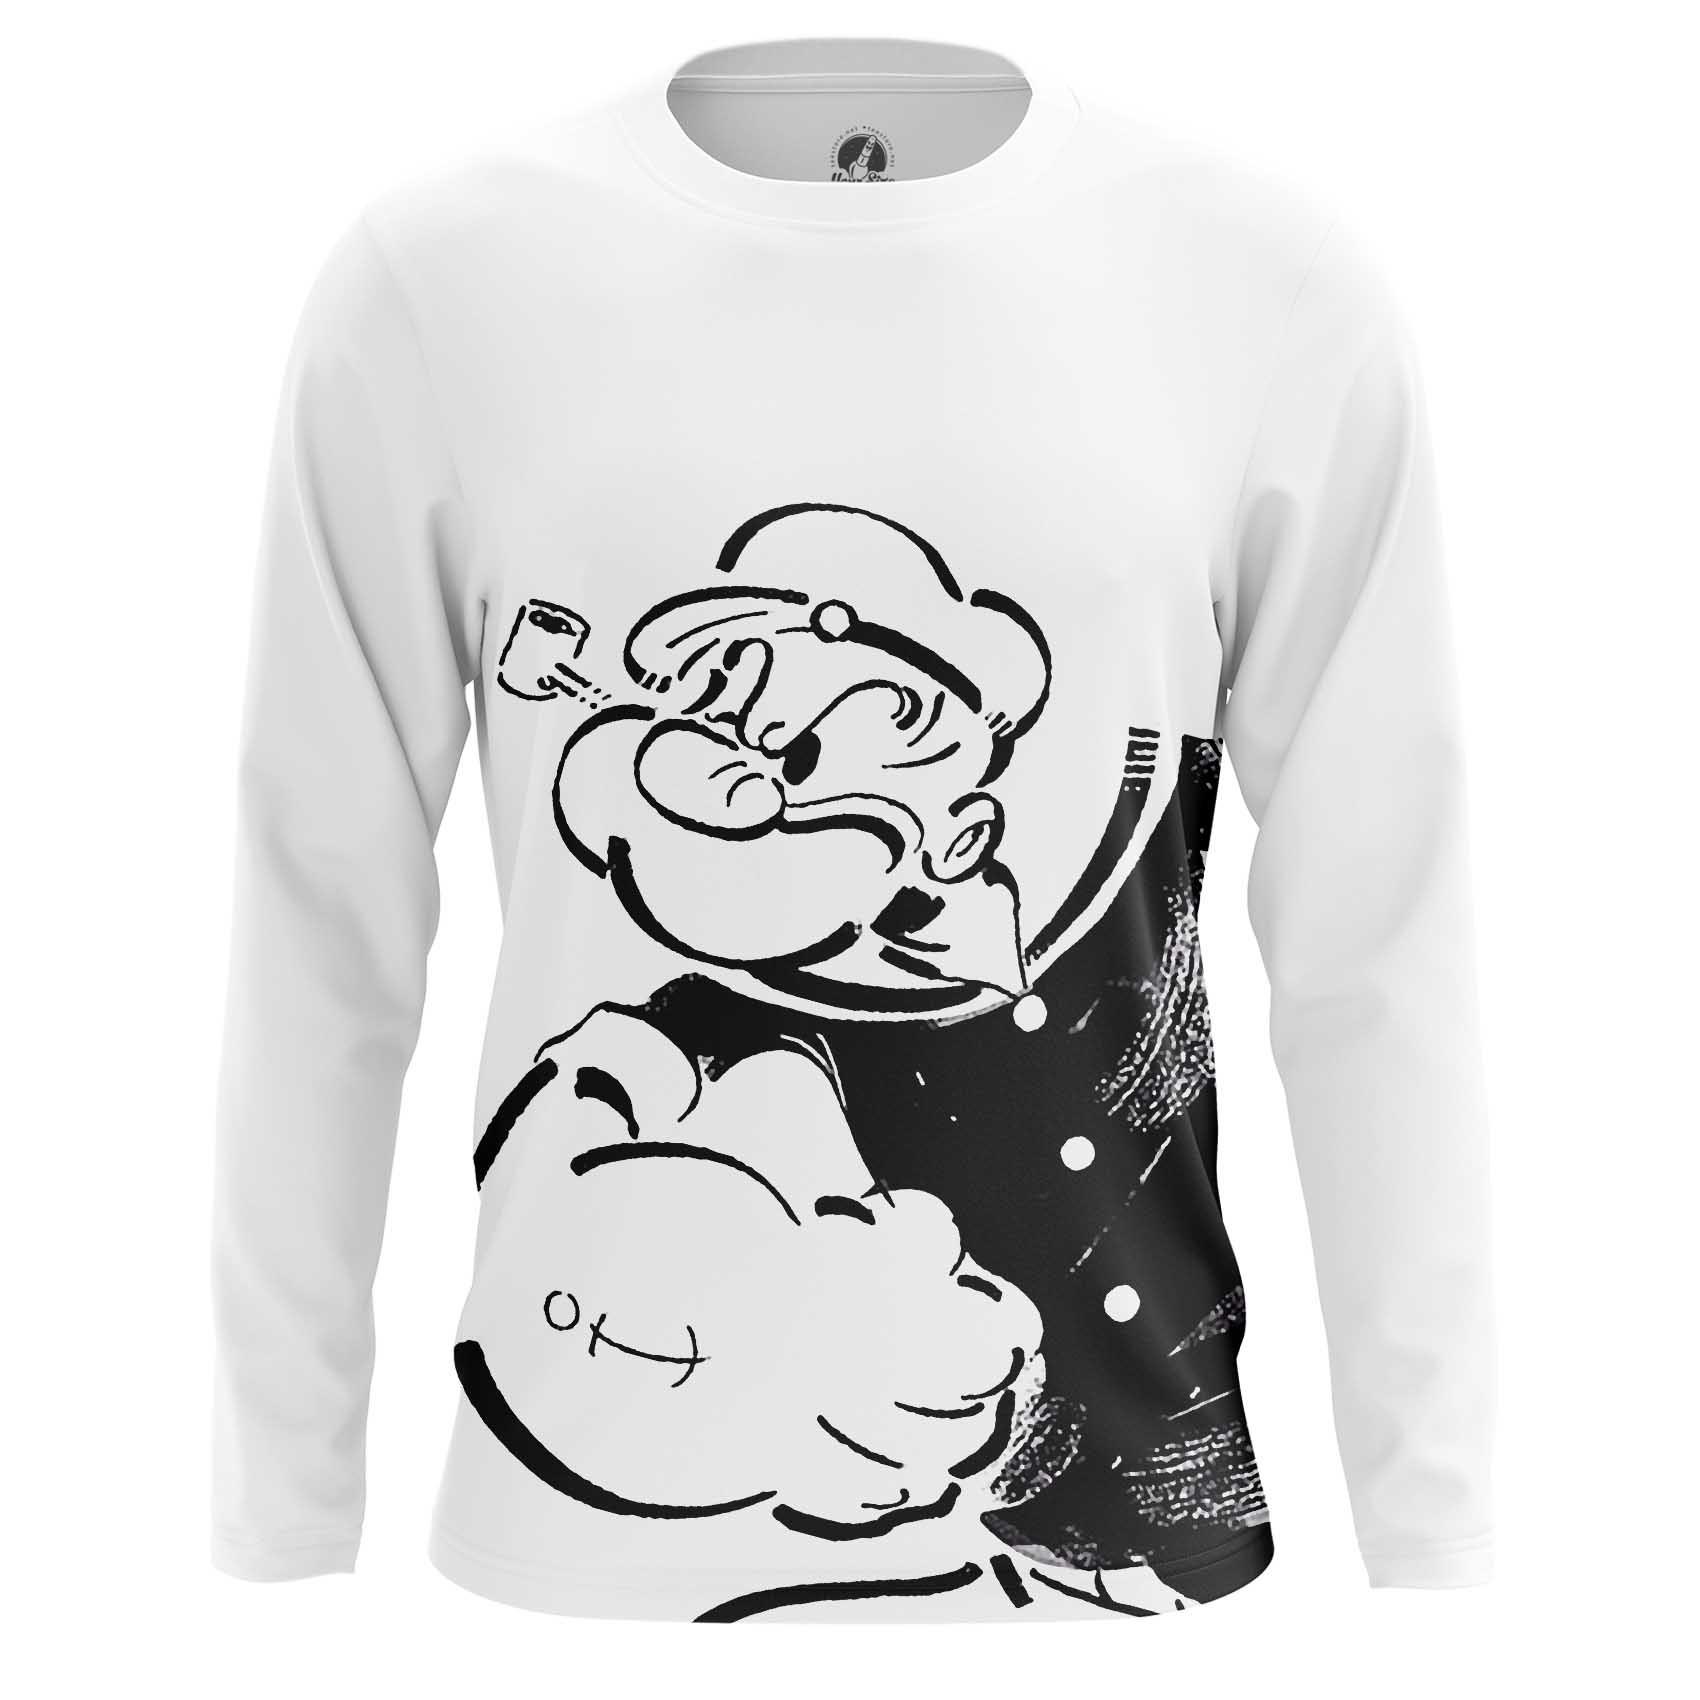 Merchandise Long Sleeve Popeye Sailor Black And White Shirts